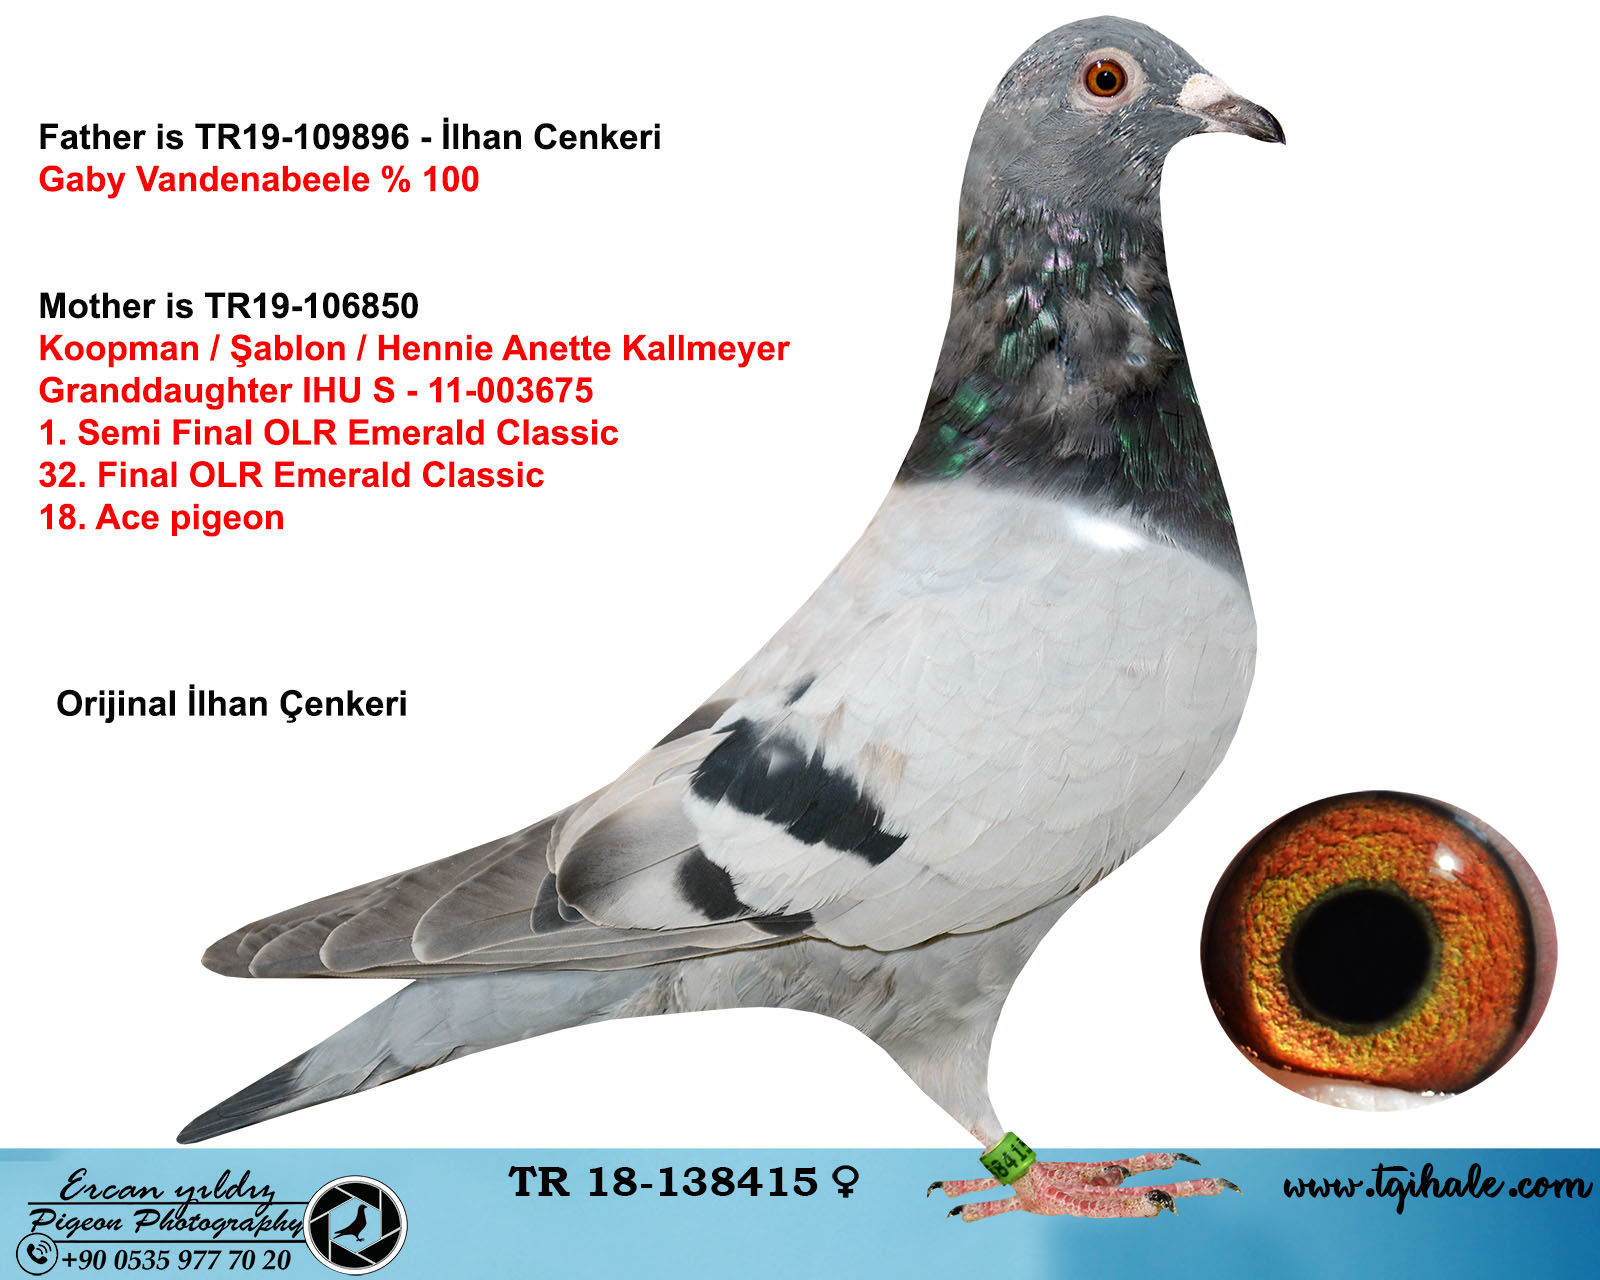 TR18-138415 DİŞİ / BABA GABY VANDENABELEE % 100 ANNE KOOPMAN-ŞABLON-KALLMEYER